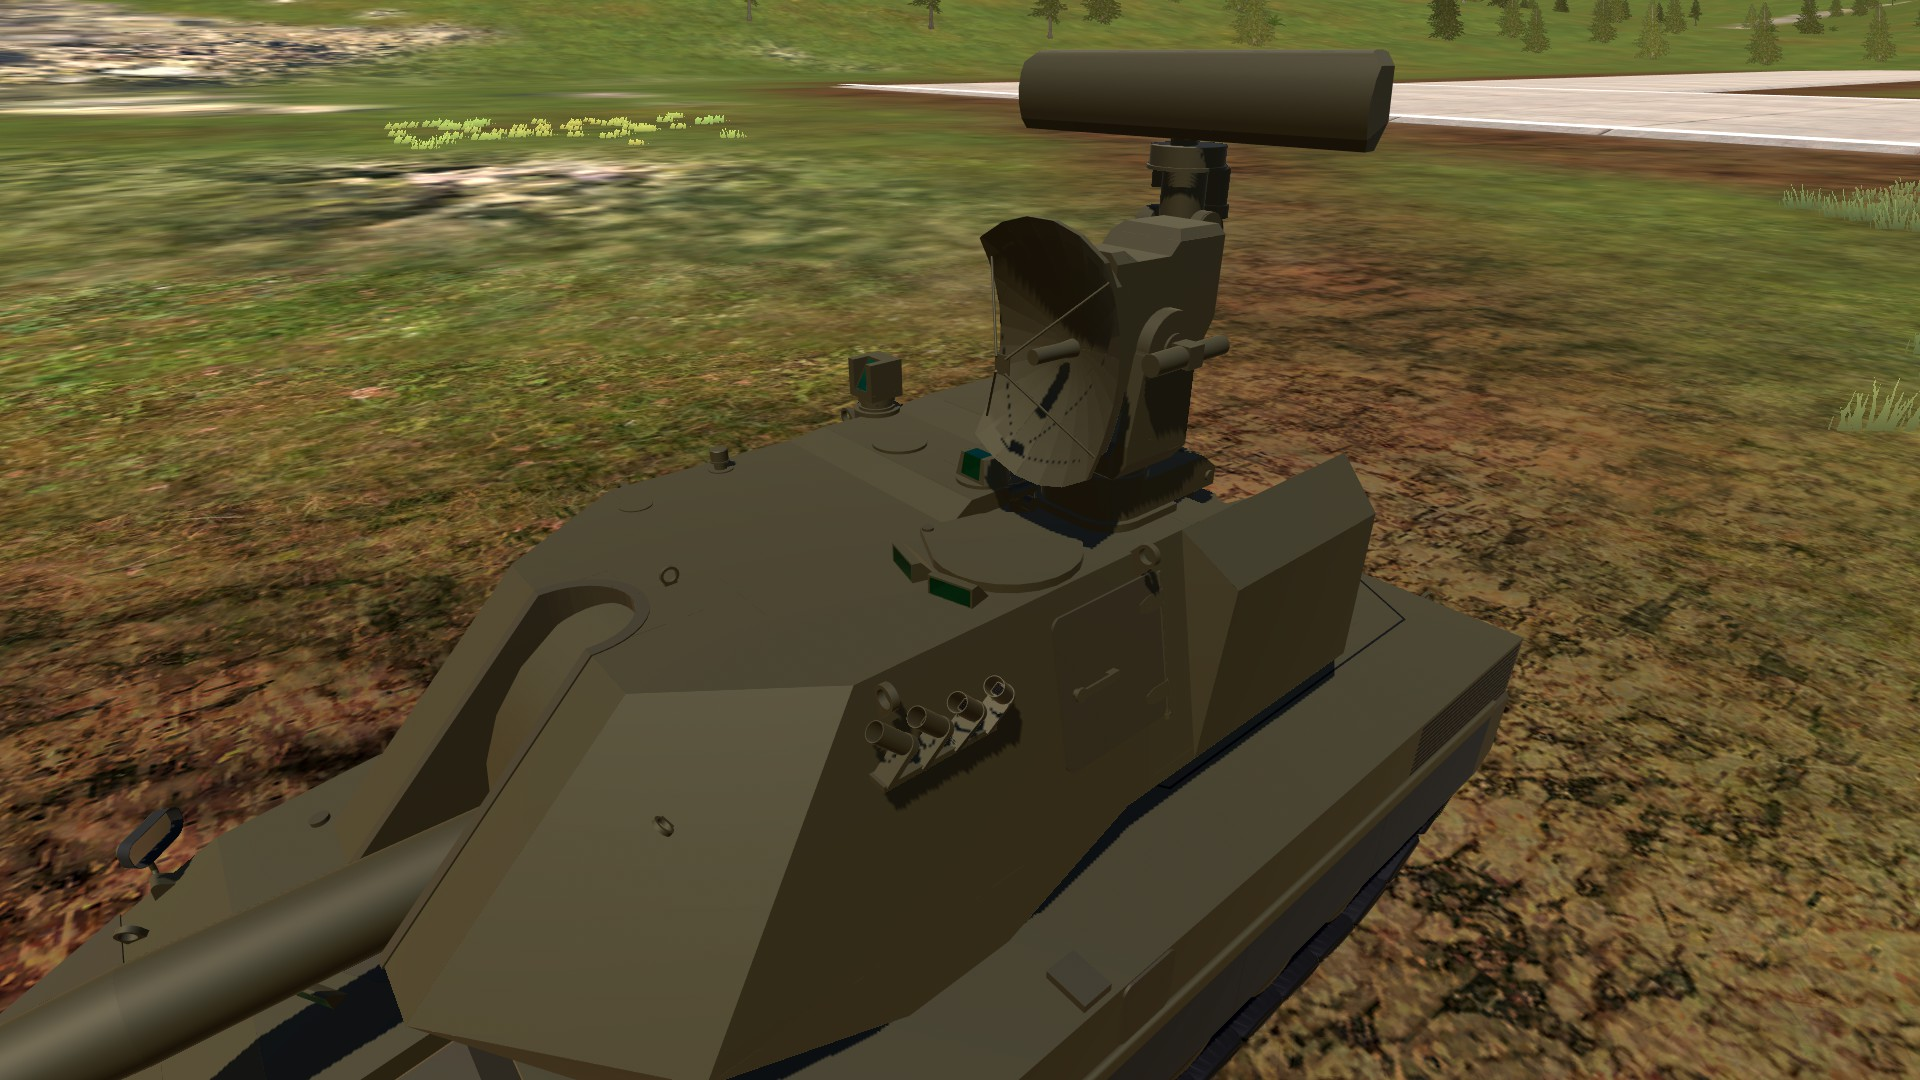 Deploying the radar